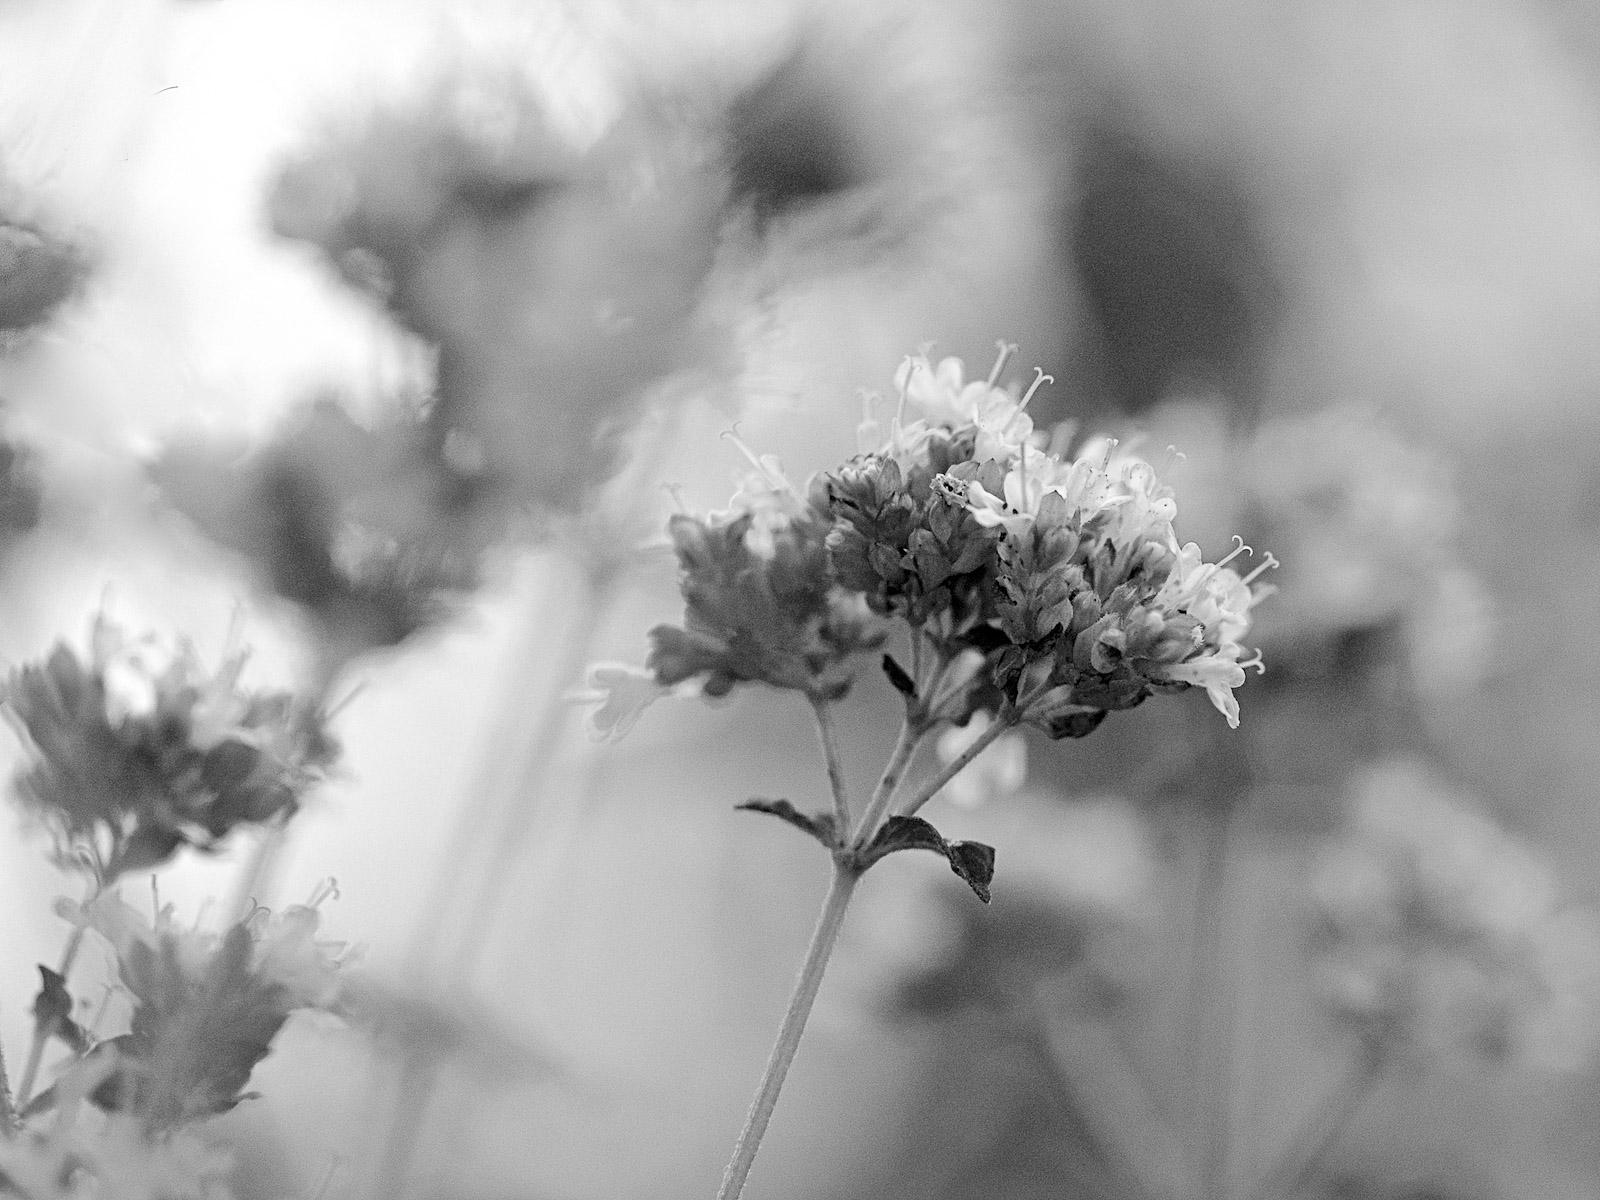 Bild02 (Foto: Ingrid Bornhofen)